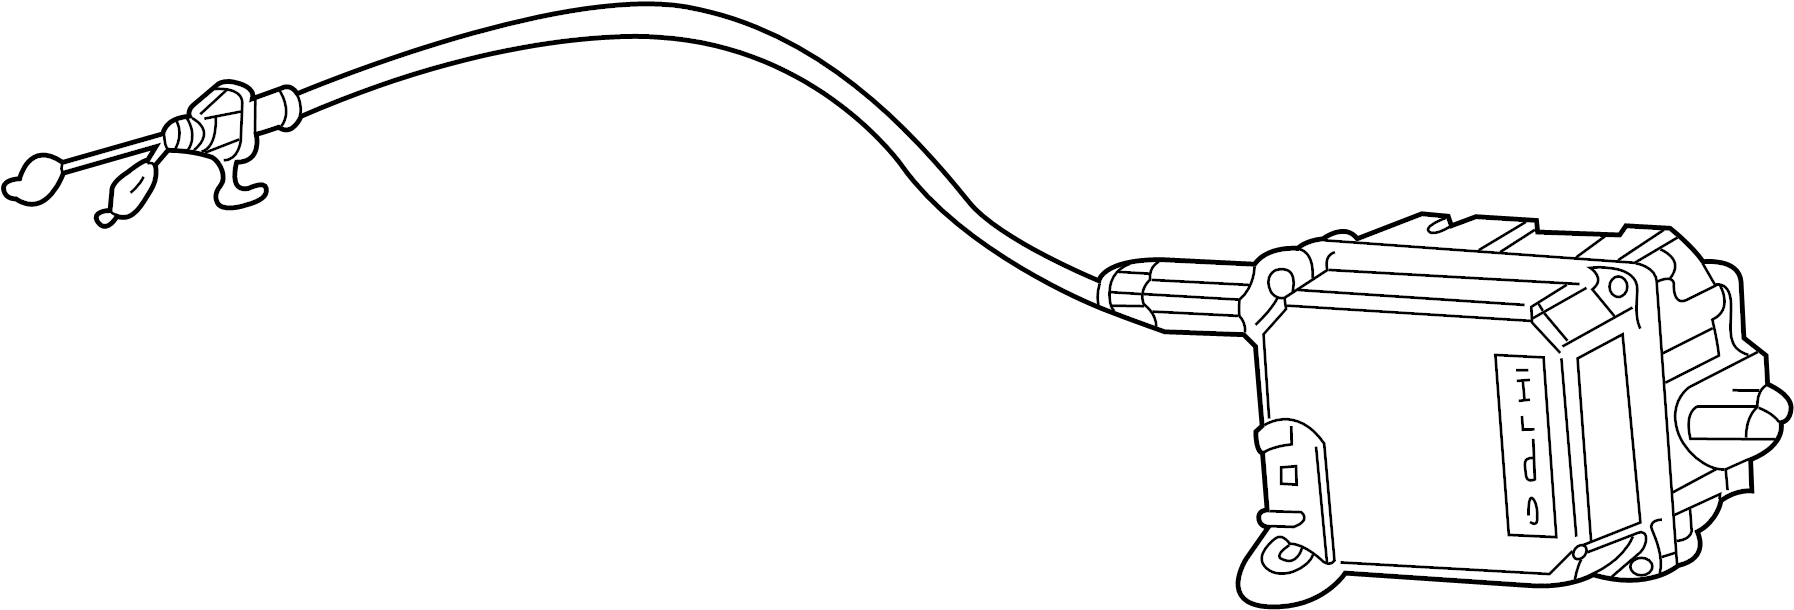 Jaguar x type module control electrical c2s27909 for Palm beach electric motors